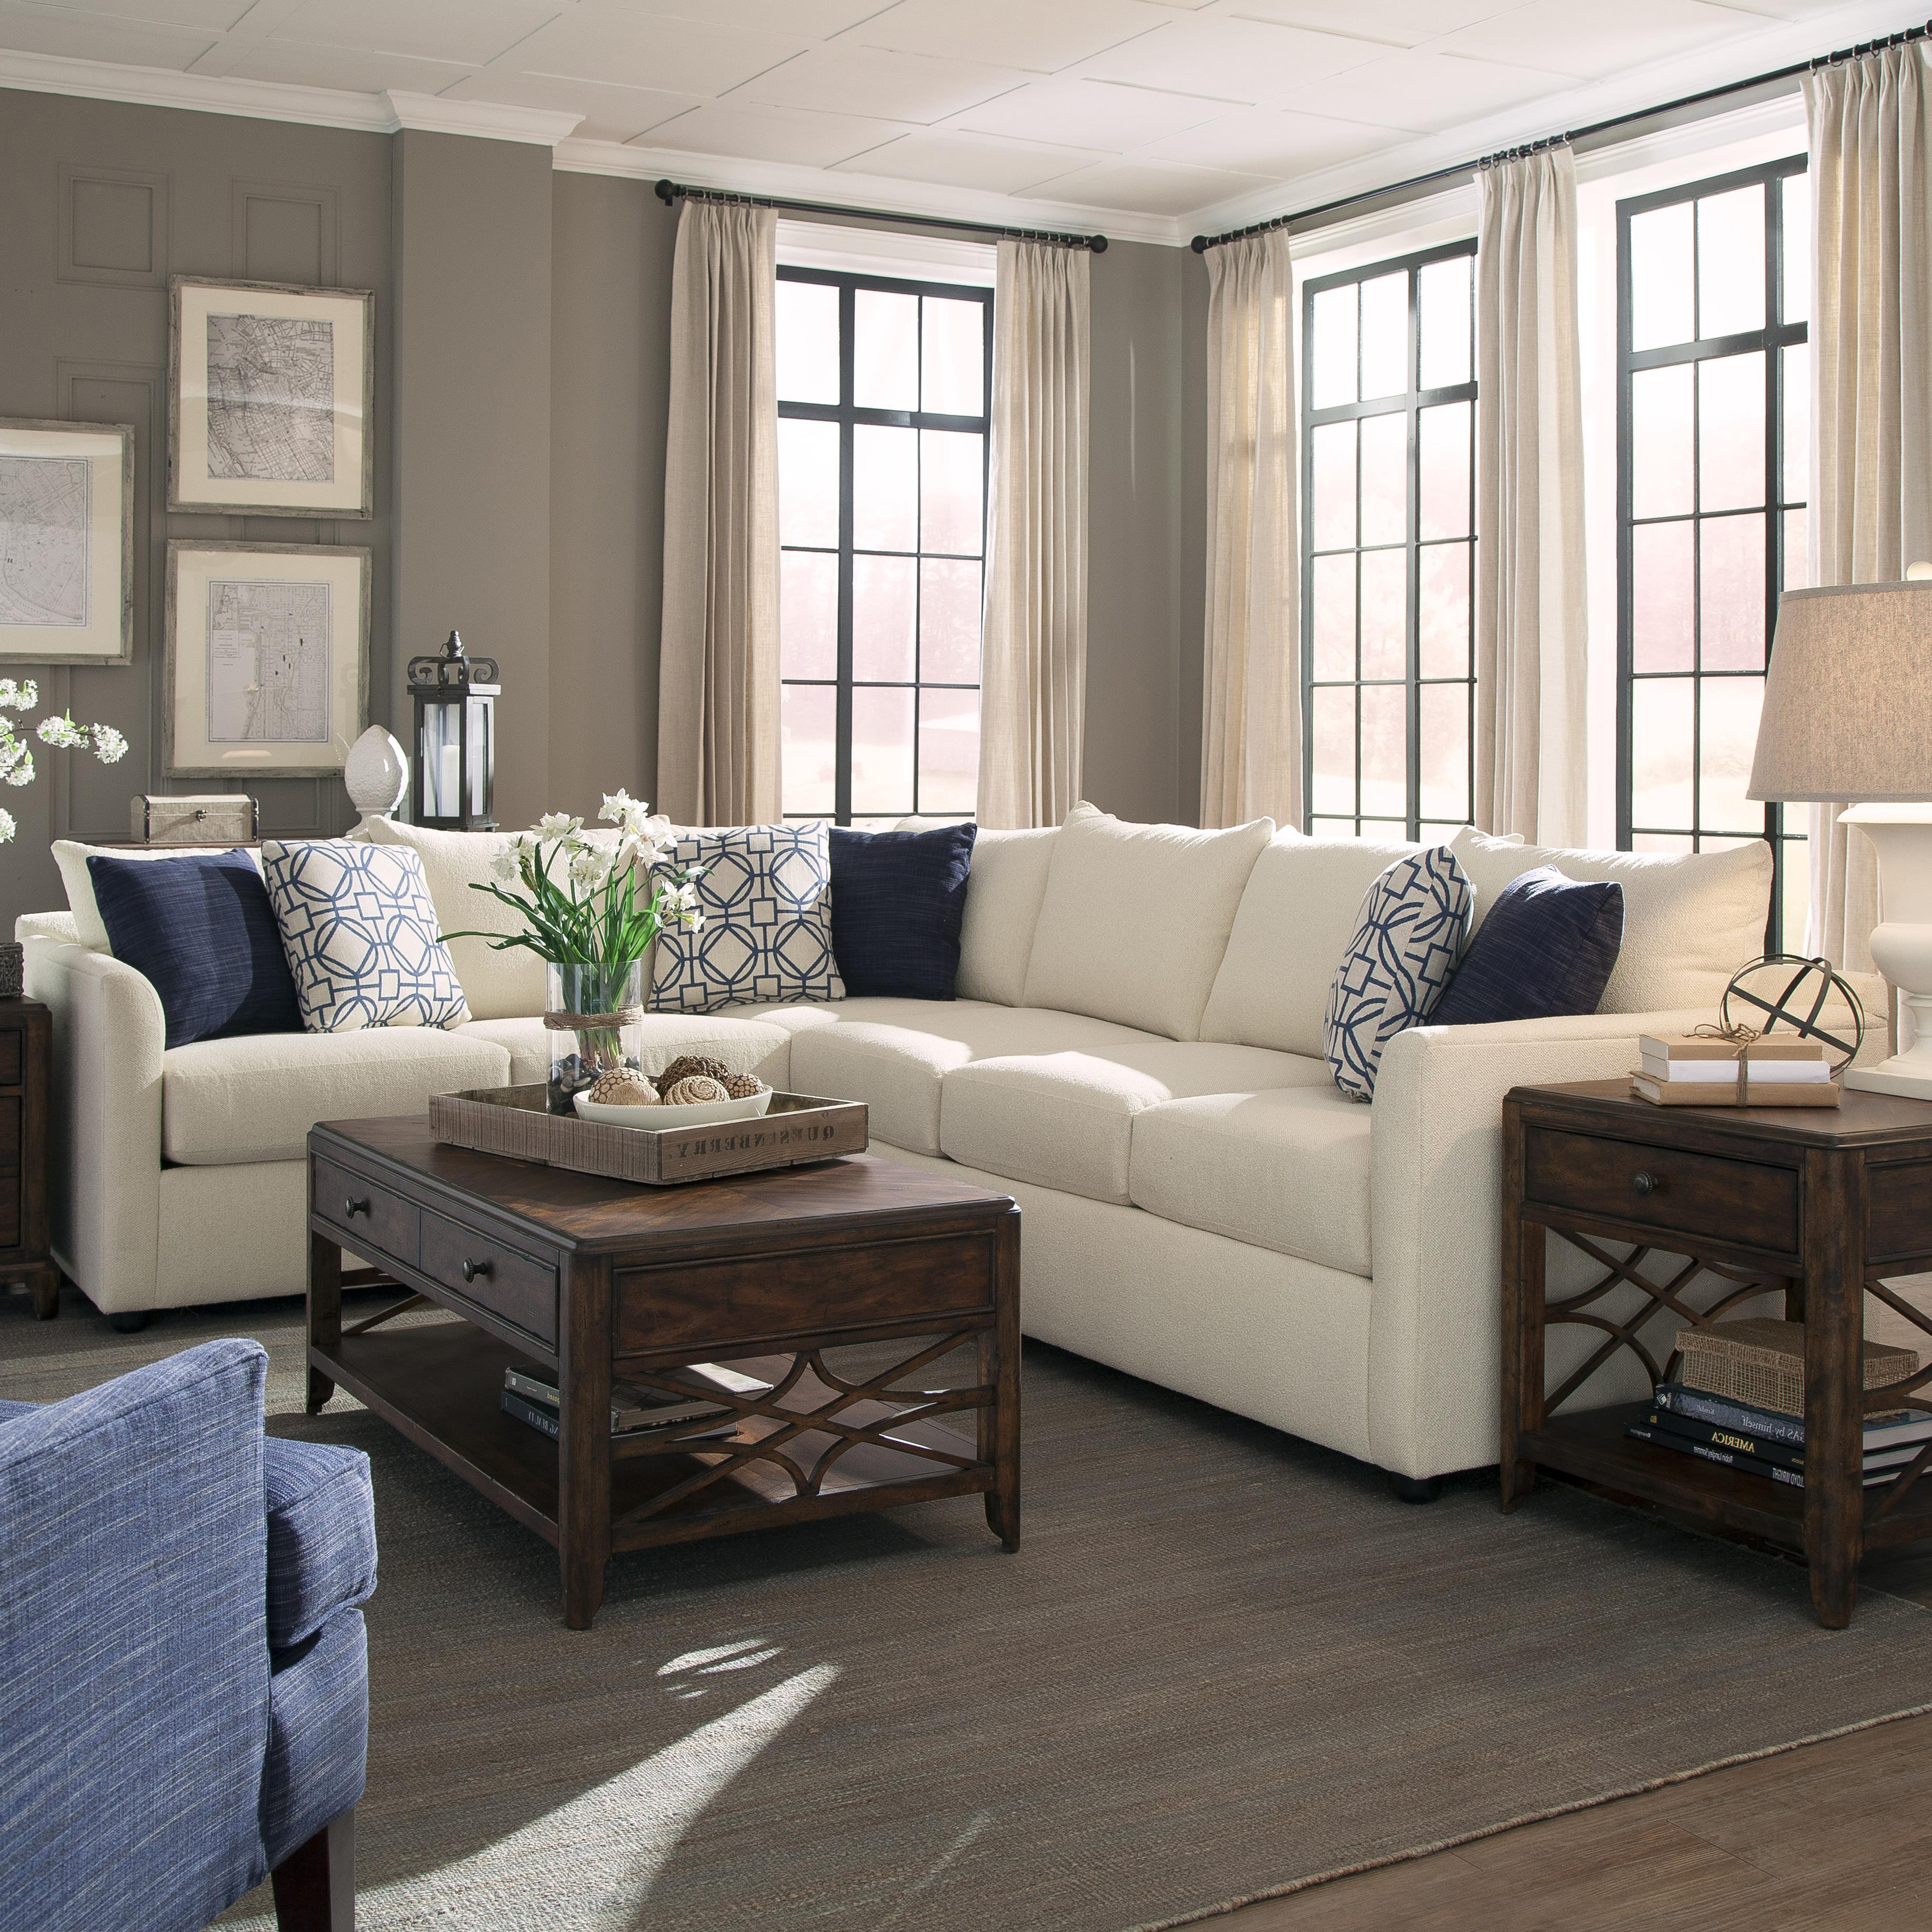 Trisha Yearwood Home Collection By Klaussner Atlanta